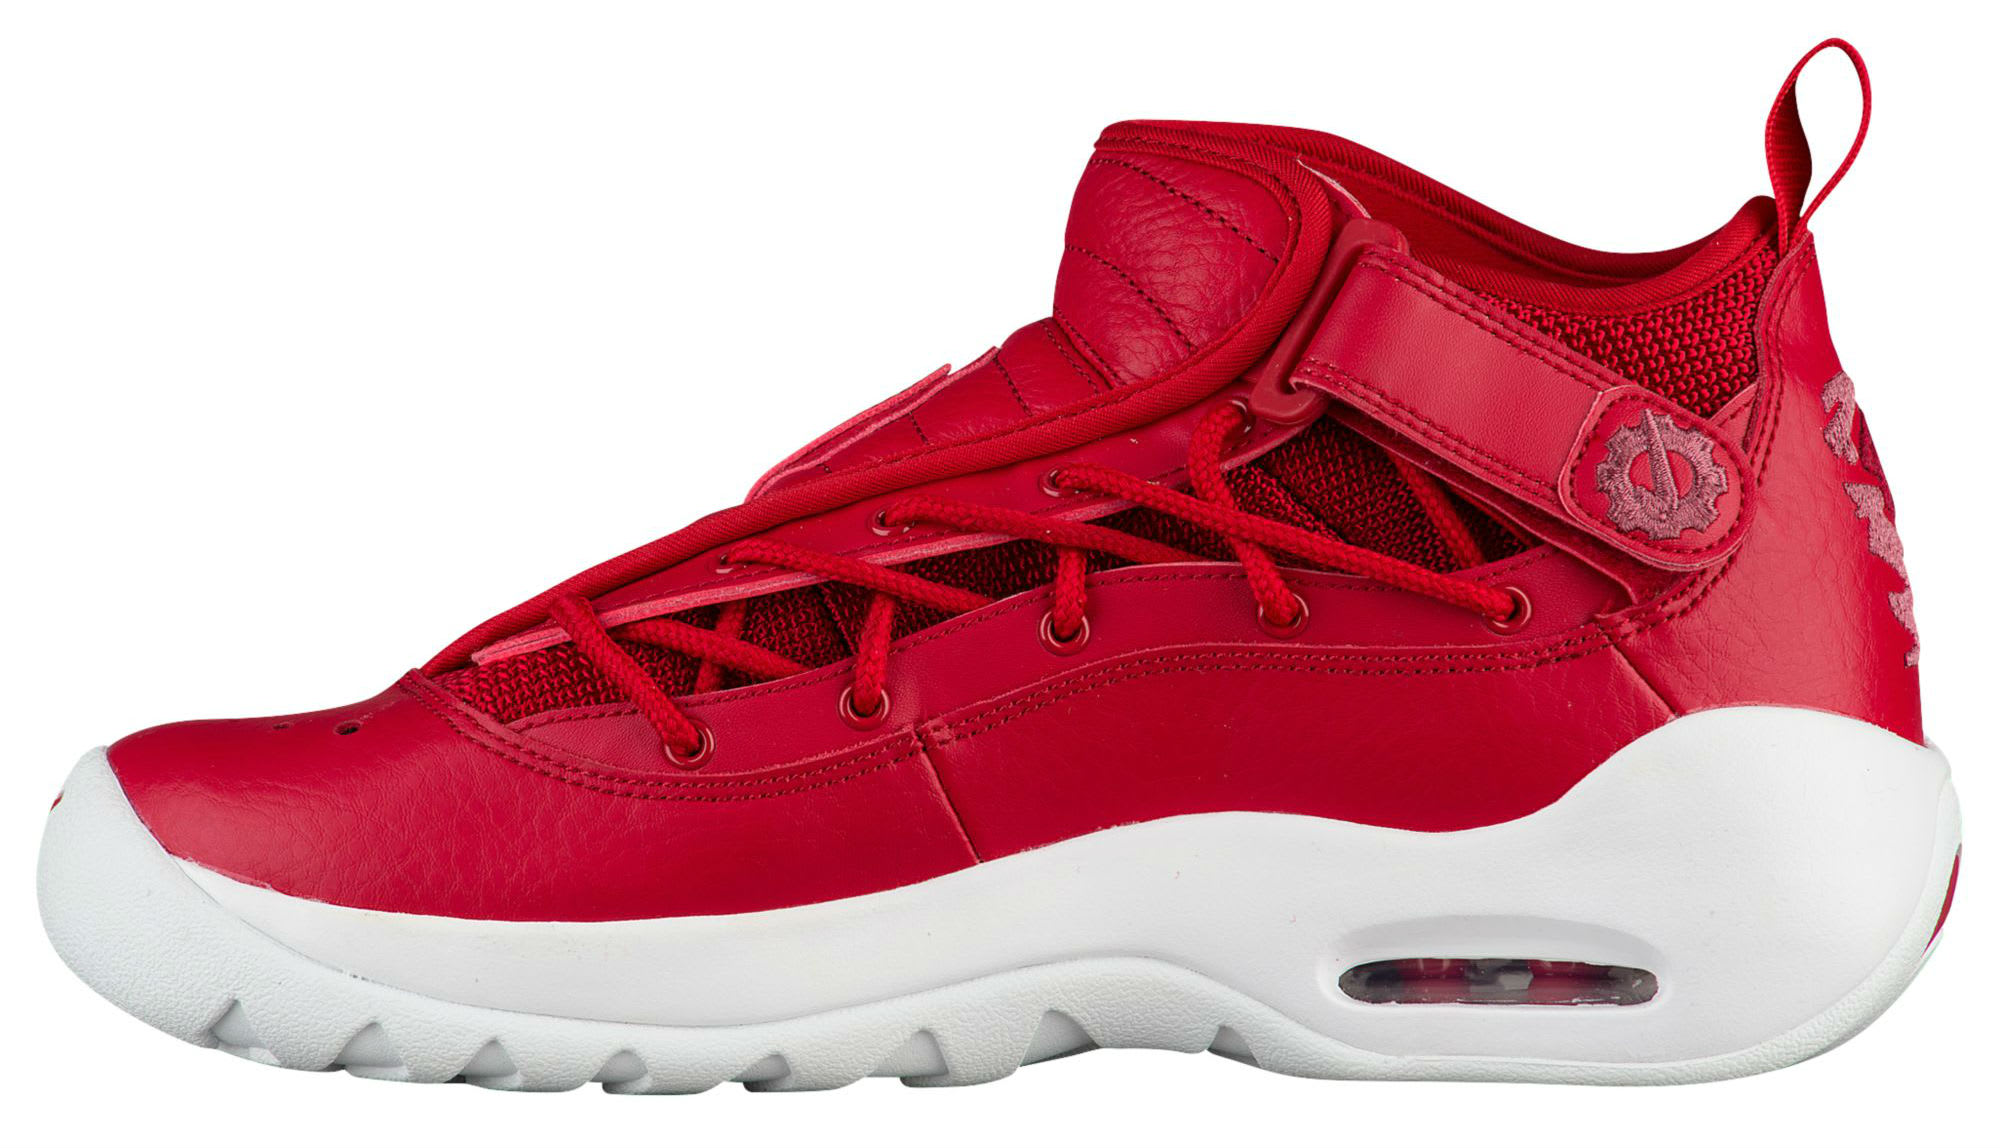 ... Nike Air Shake Ndestrukt Red LeatherRelease Date Medial 880869-600 ... 34ea5ccf2